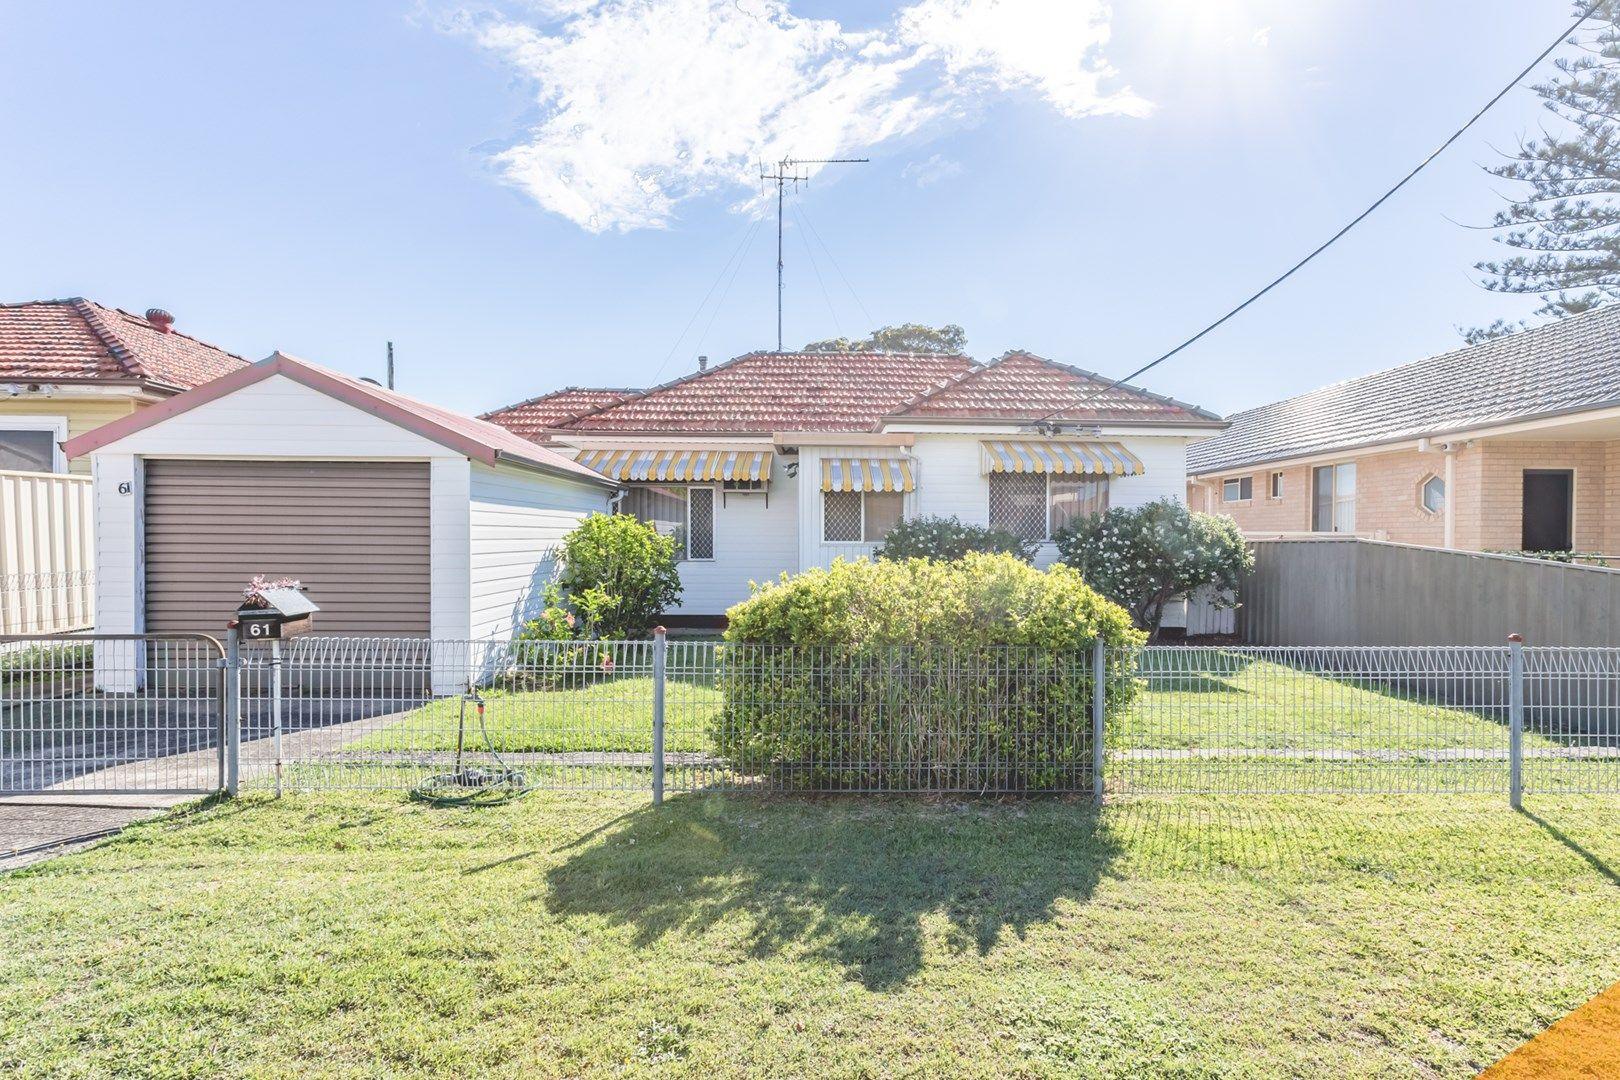 61 Albert Street, Warners Bay NSW 2282, Image 0